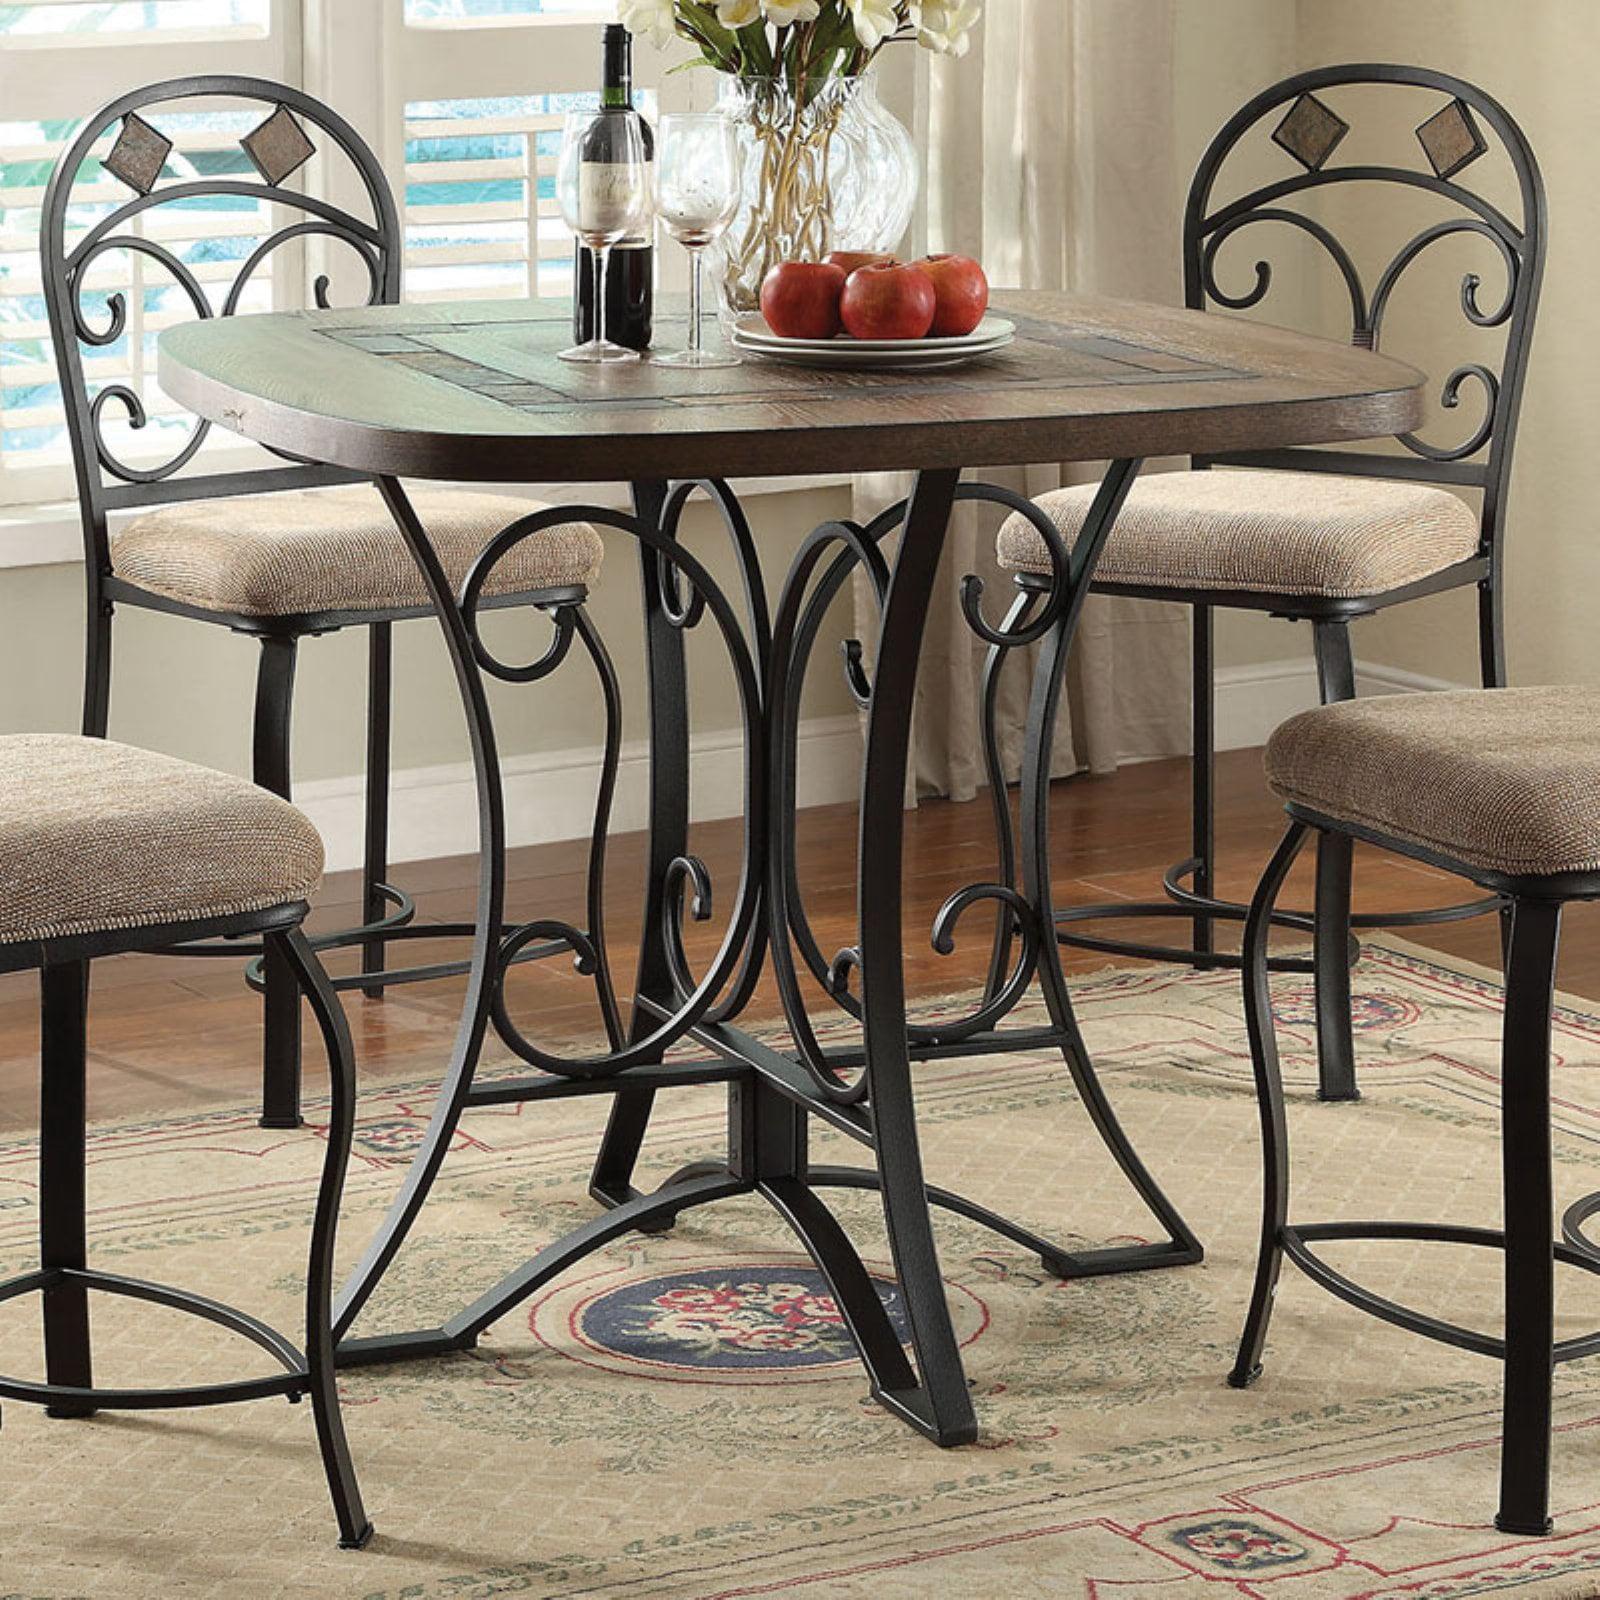 ACME Kiele Counter Height Table, Oak & Antique Black